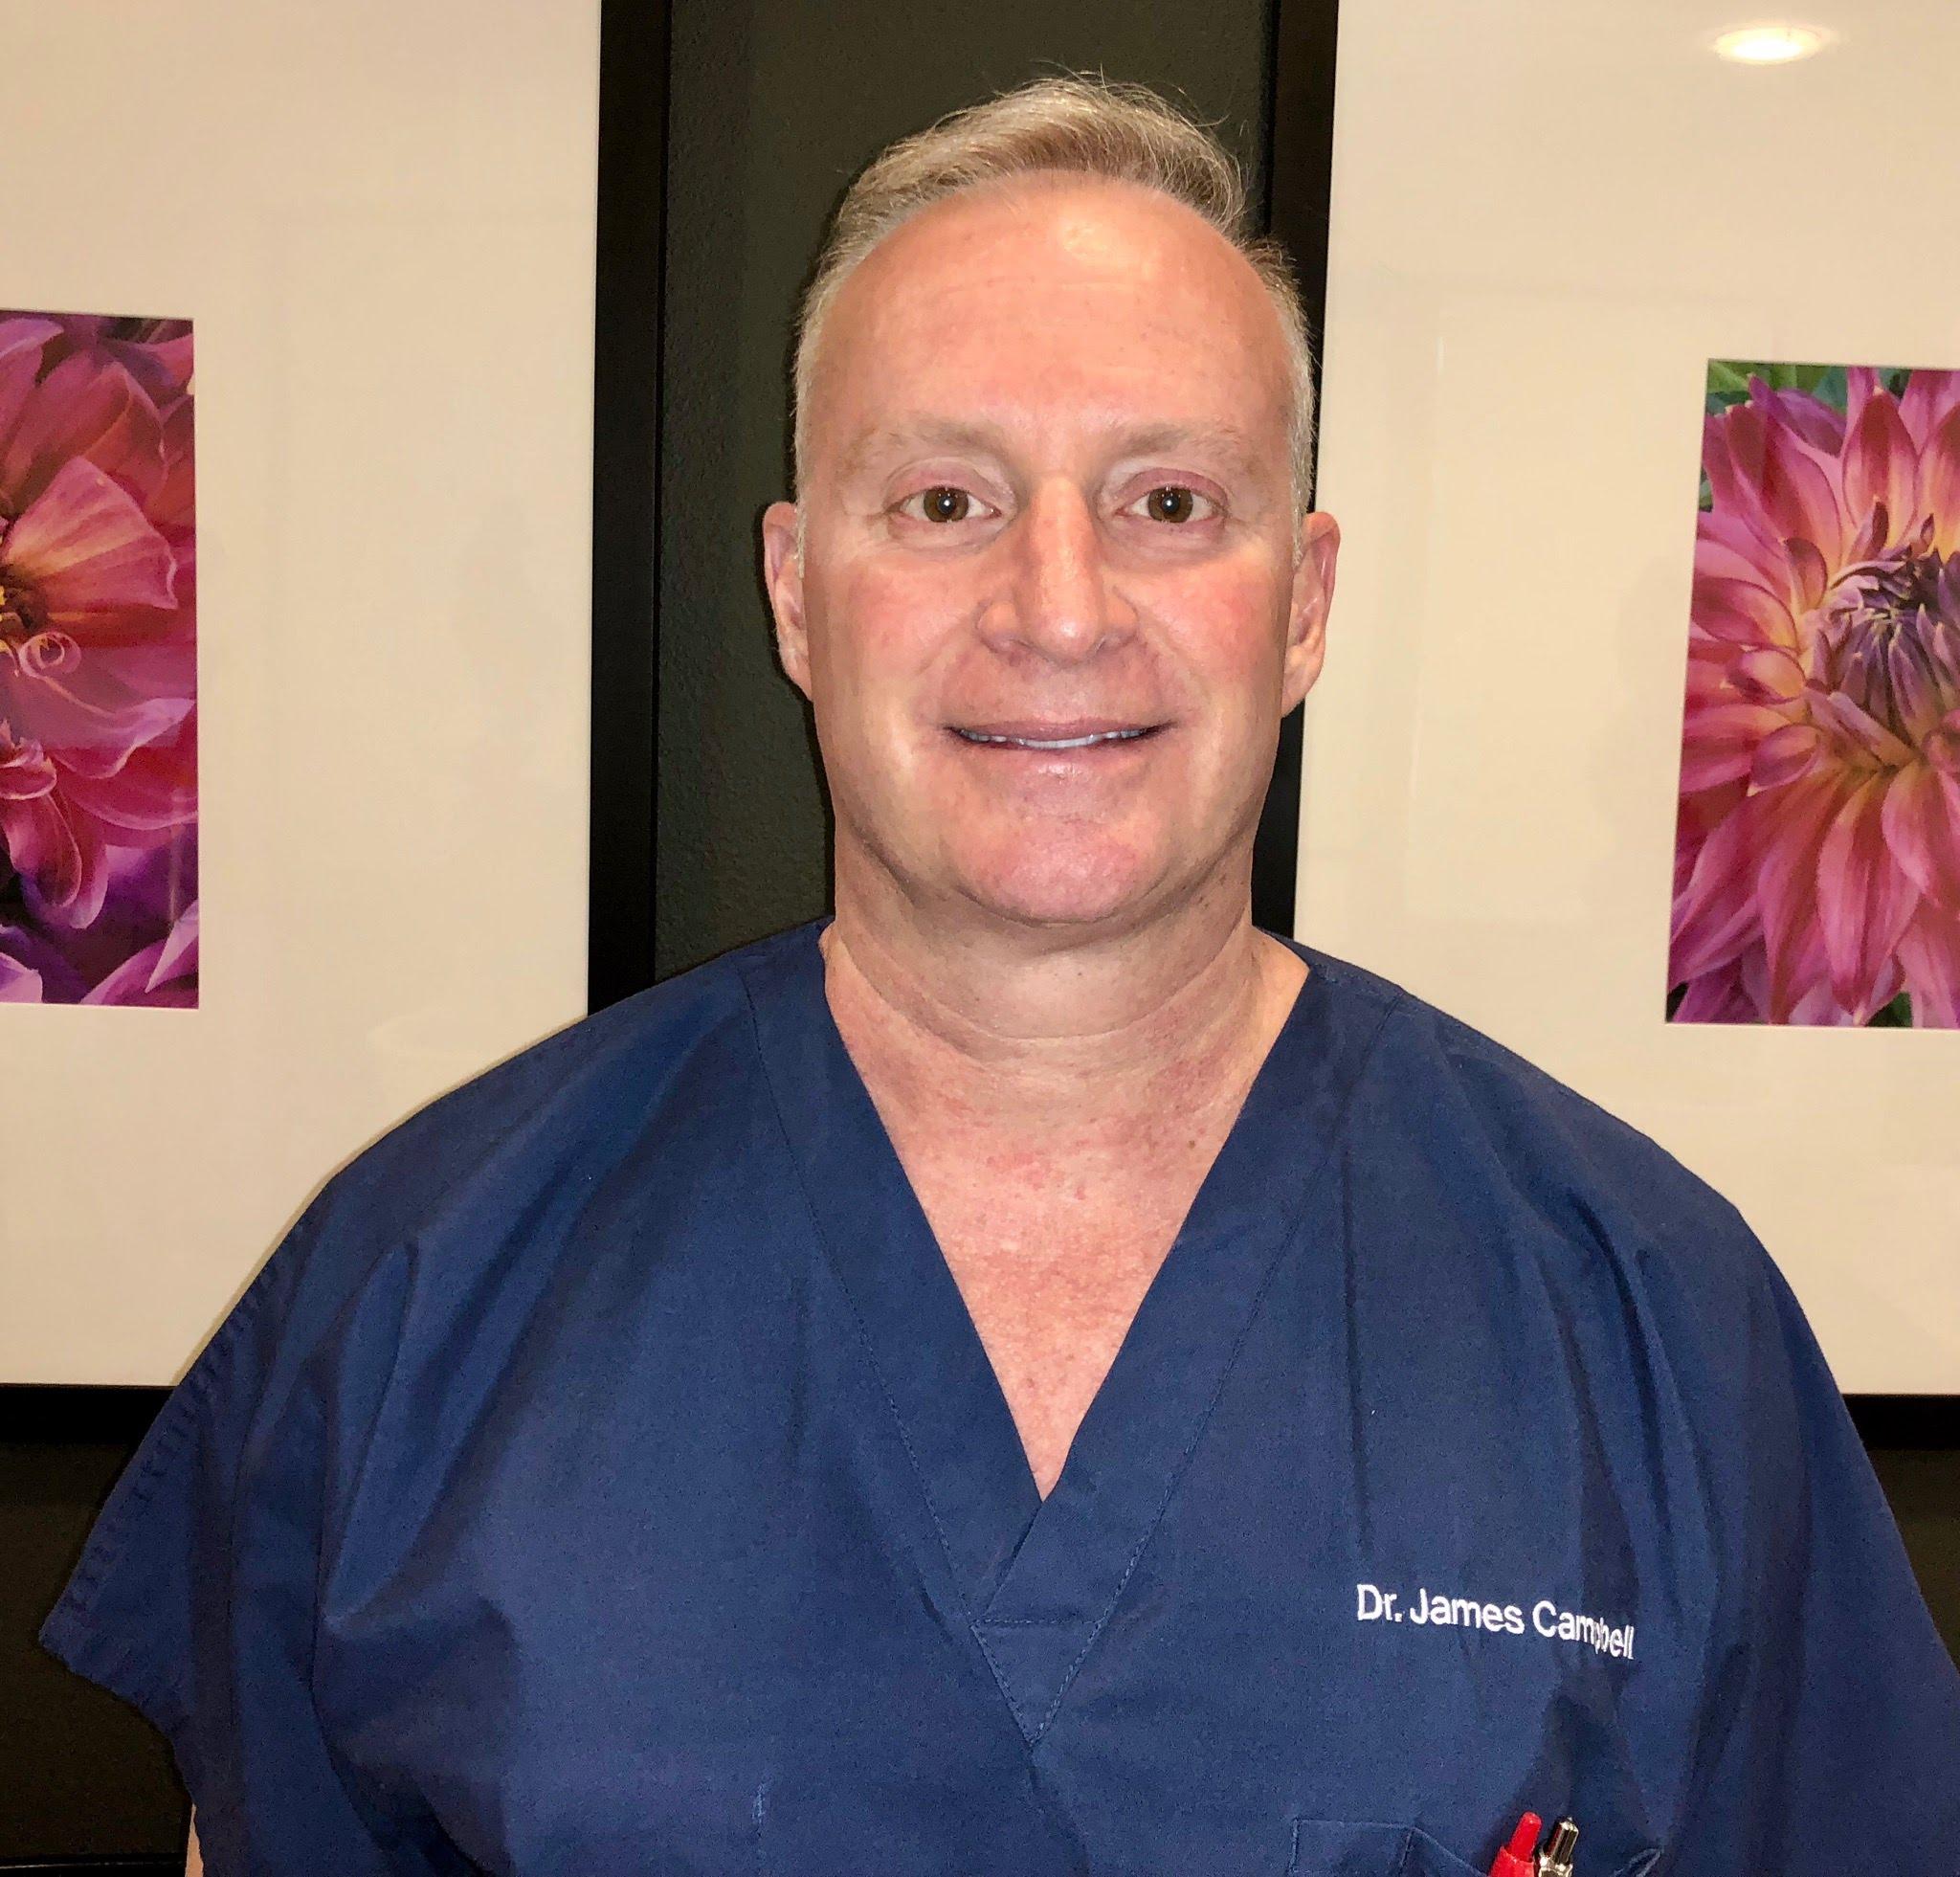 Chiropractor in Las Vegas, NV - James Campbell